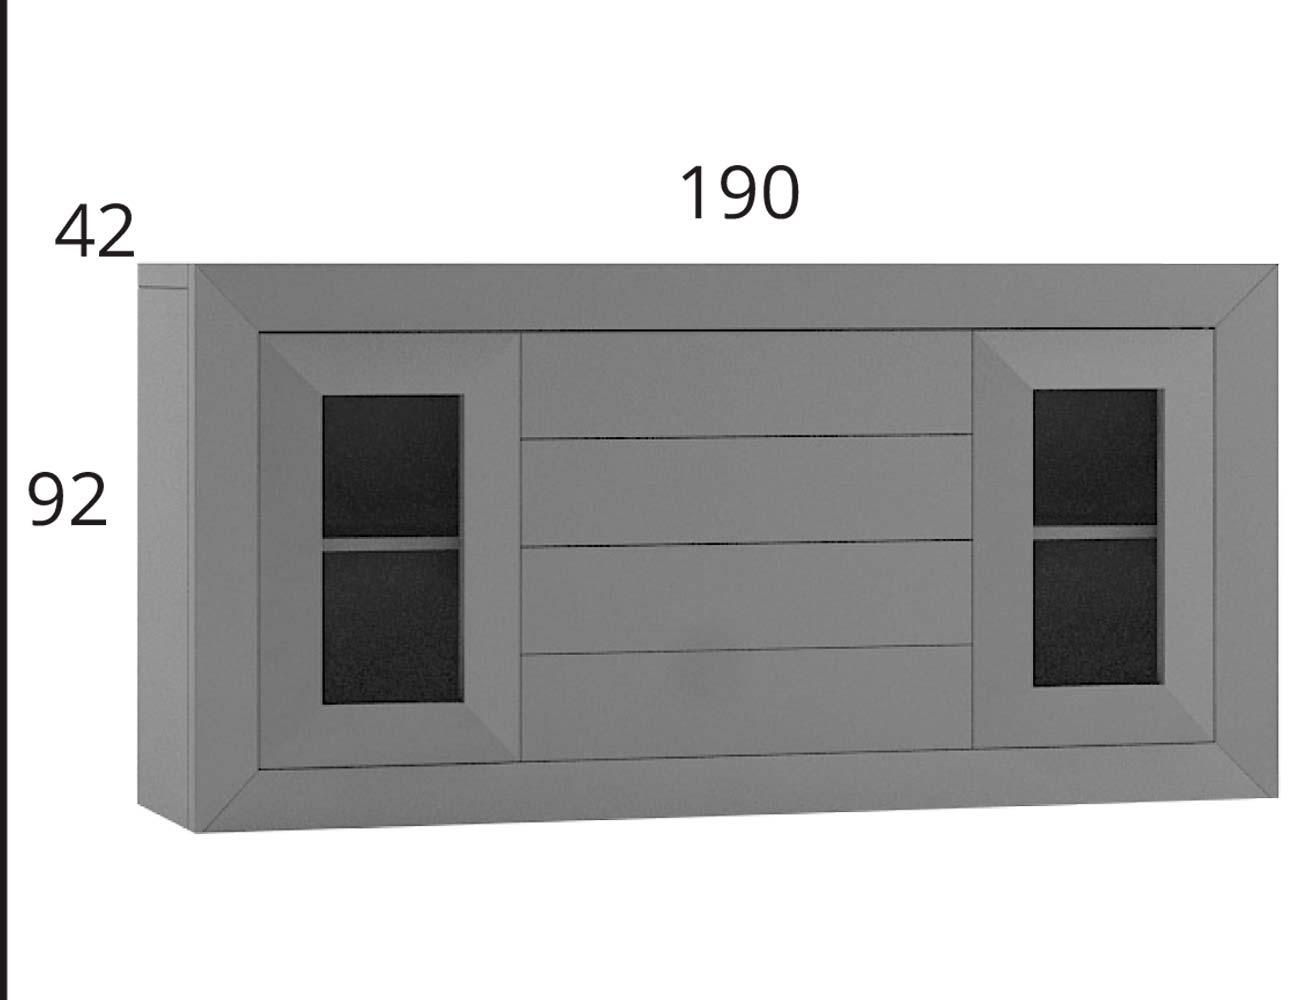 A0712